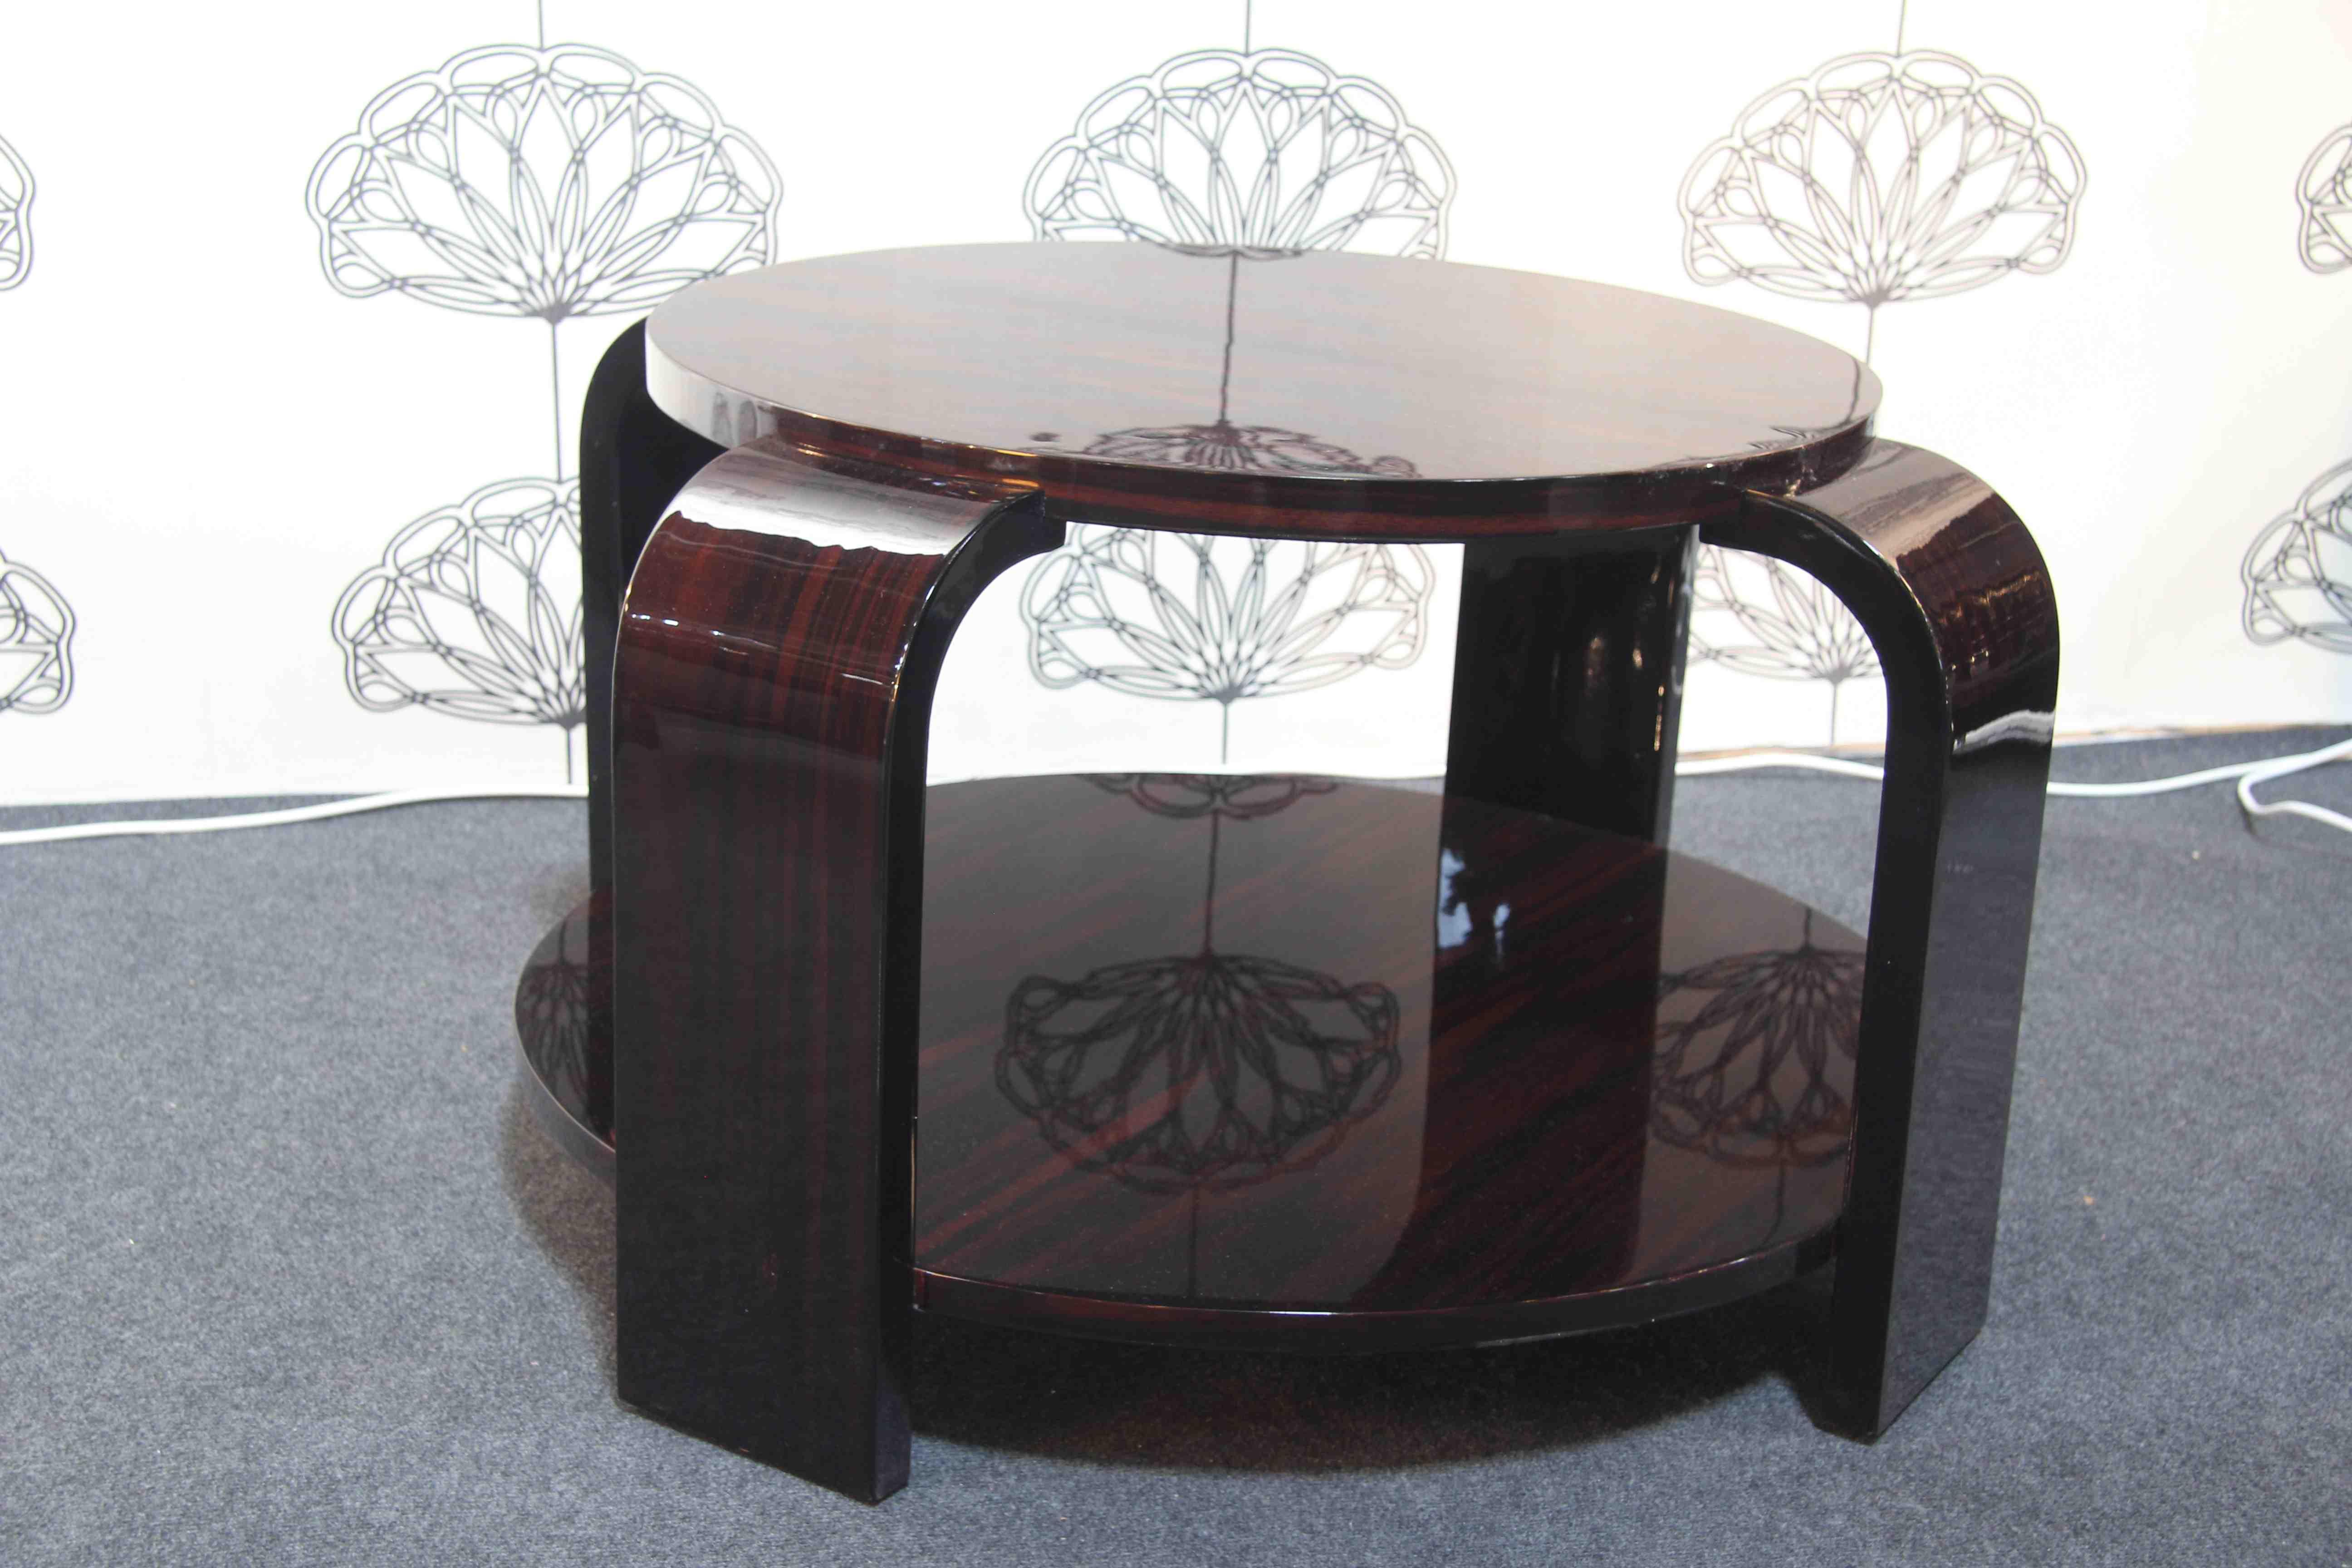 table basse art deco en b ne de macassar art deco table ebony vendu esprit art d co vente. Black Bedroom Furniture Sets. Home Design Ideas